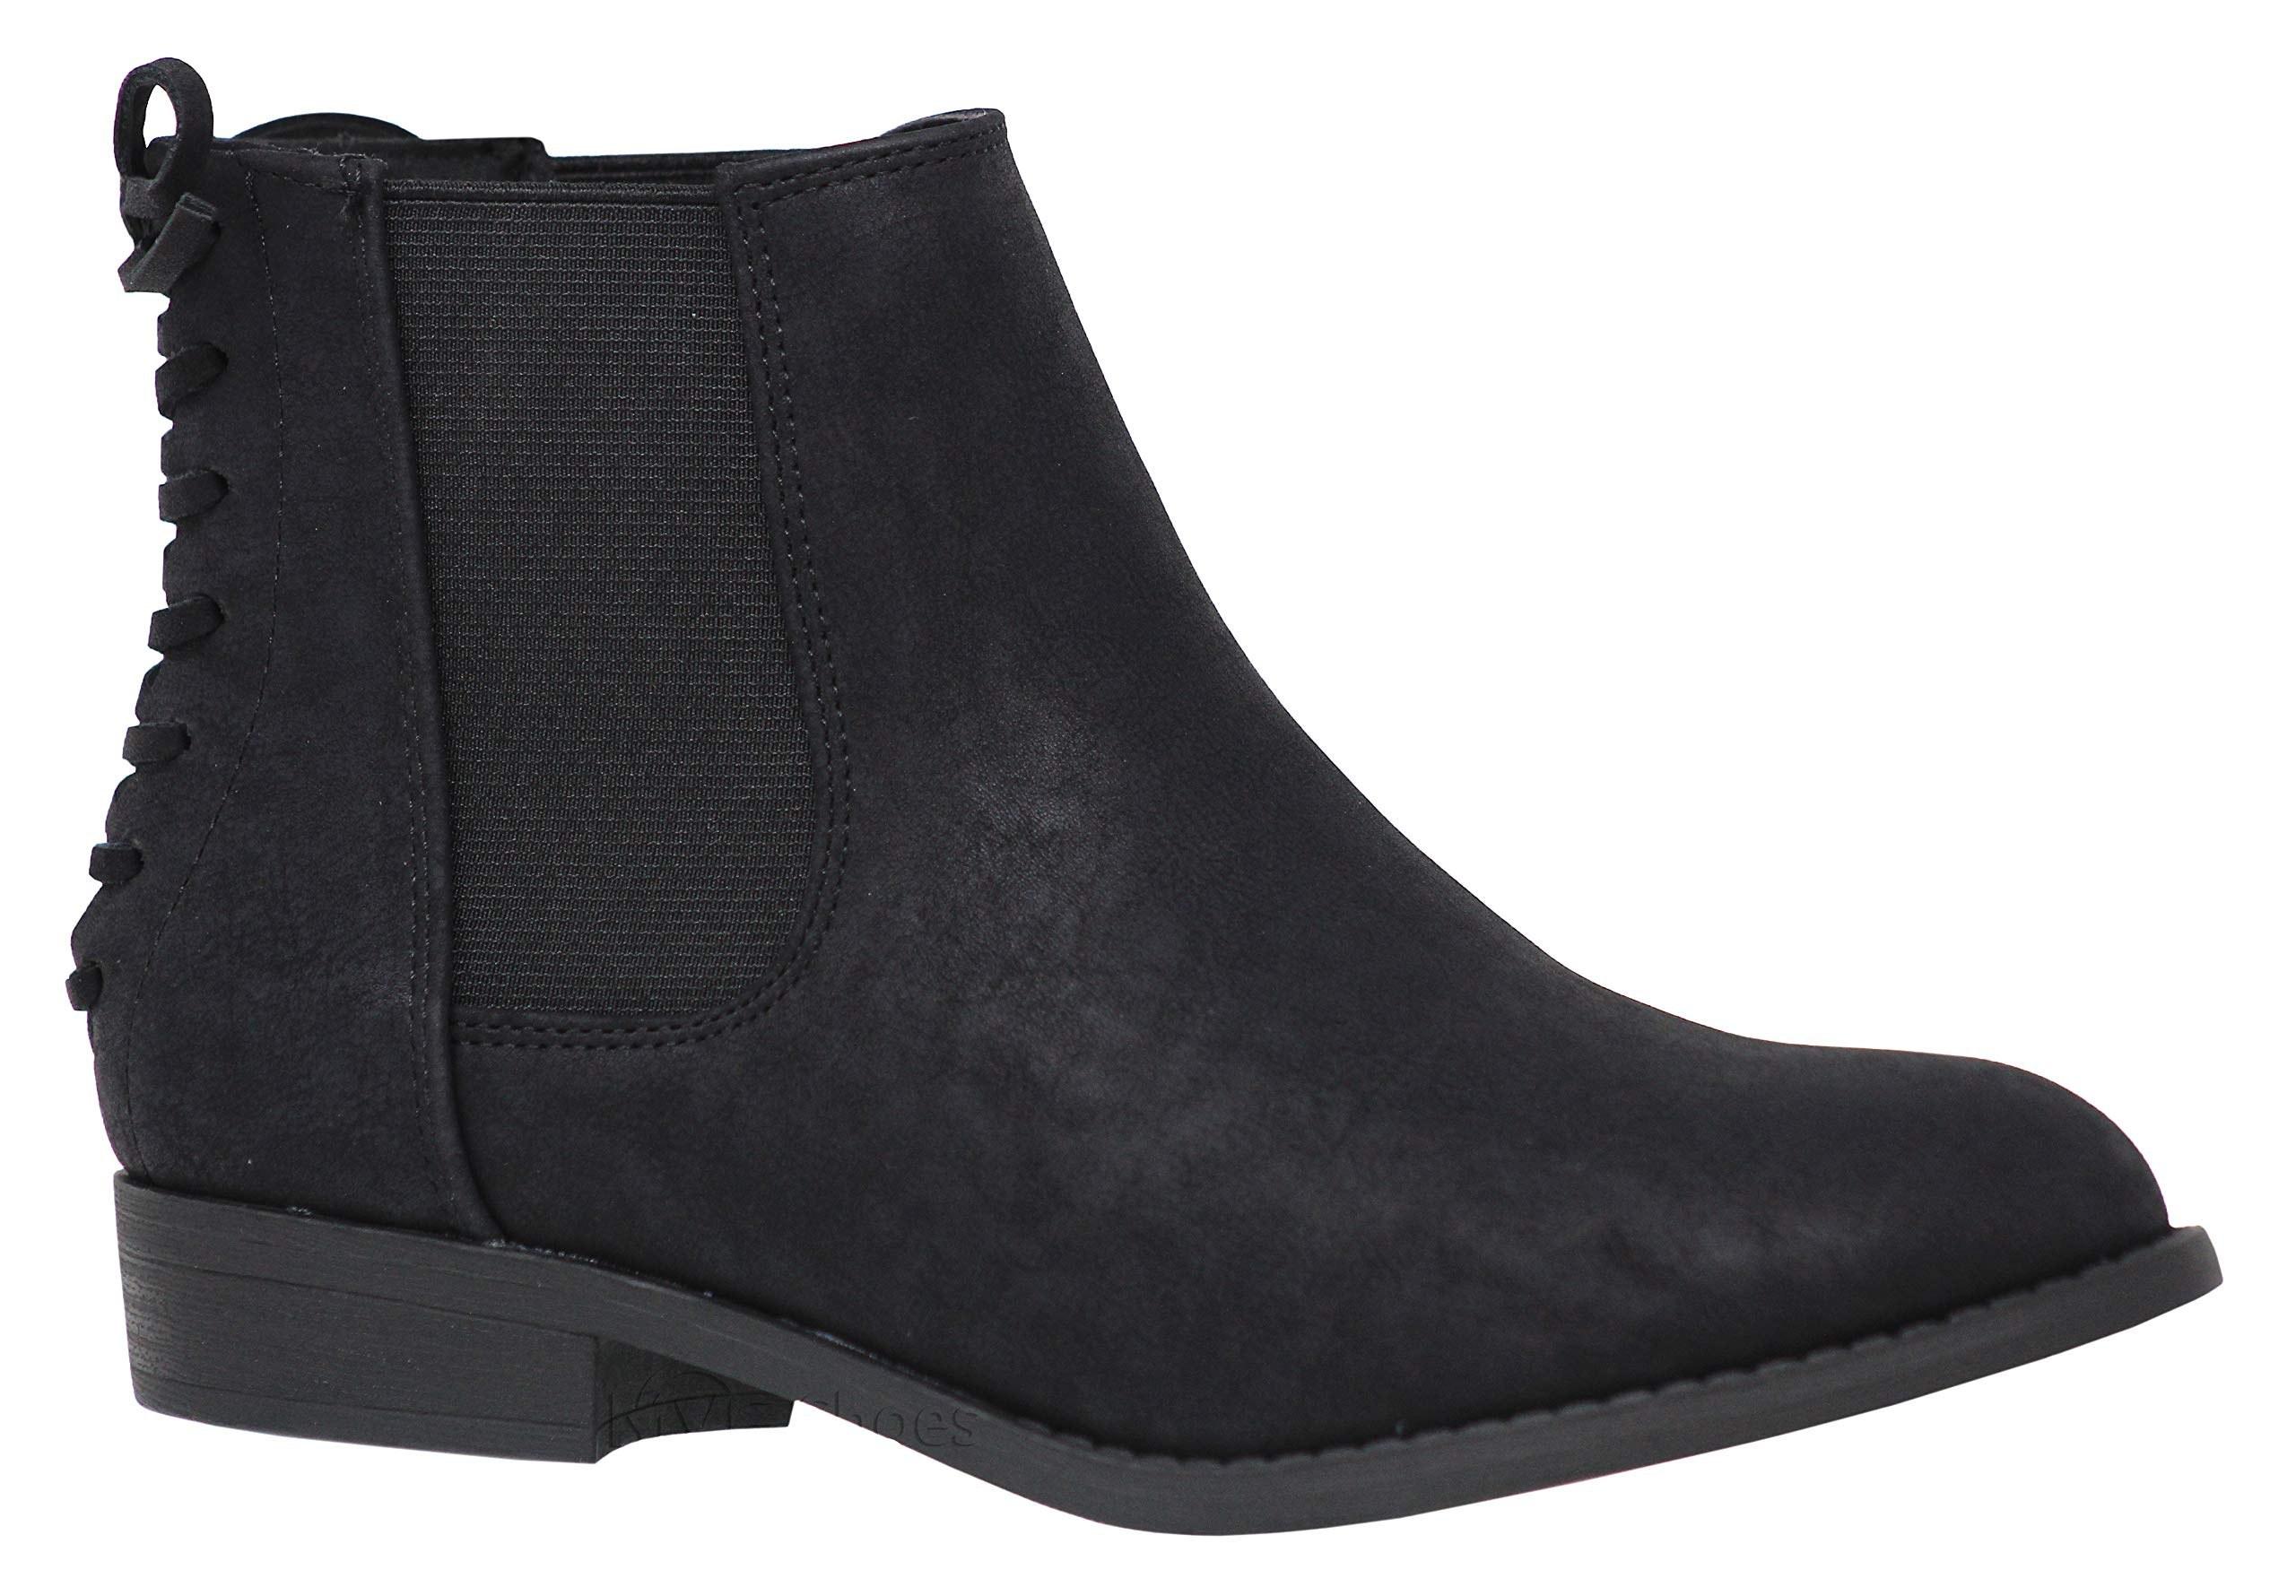 89ebf5ee516 MVE Shoes Cute Western Cowboy Bootie - Womens Pointed Toe Slip On Ankle  Boot -Back Zip up Low Heel